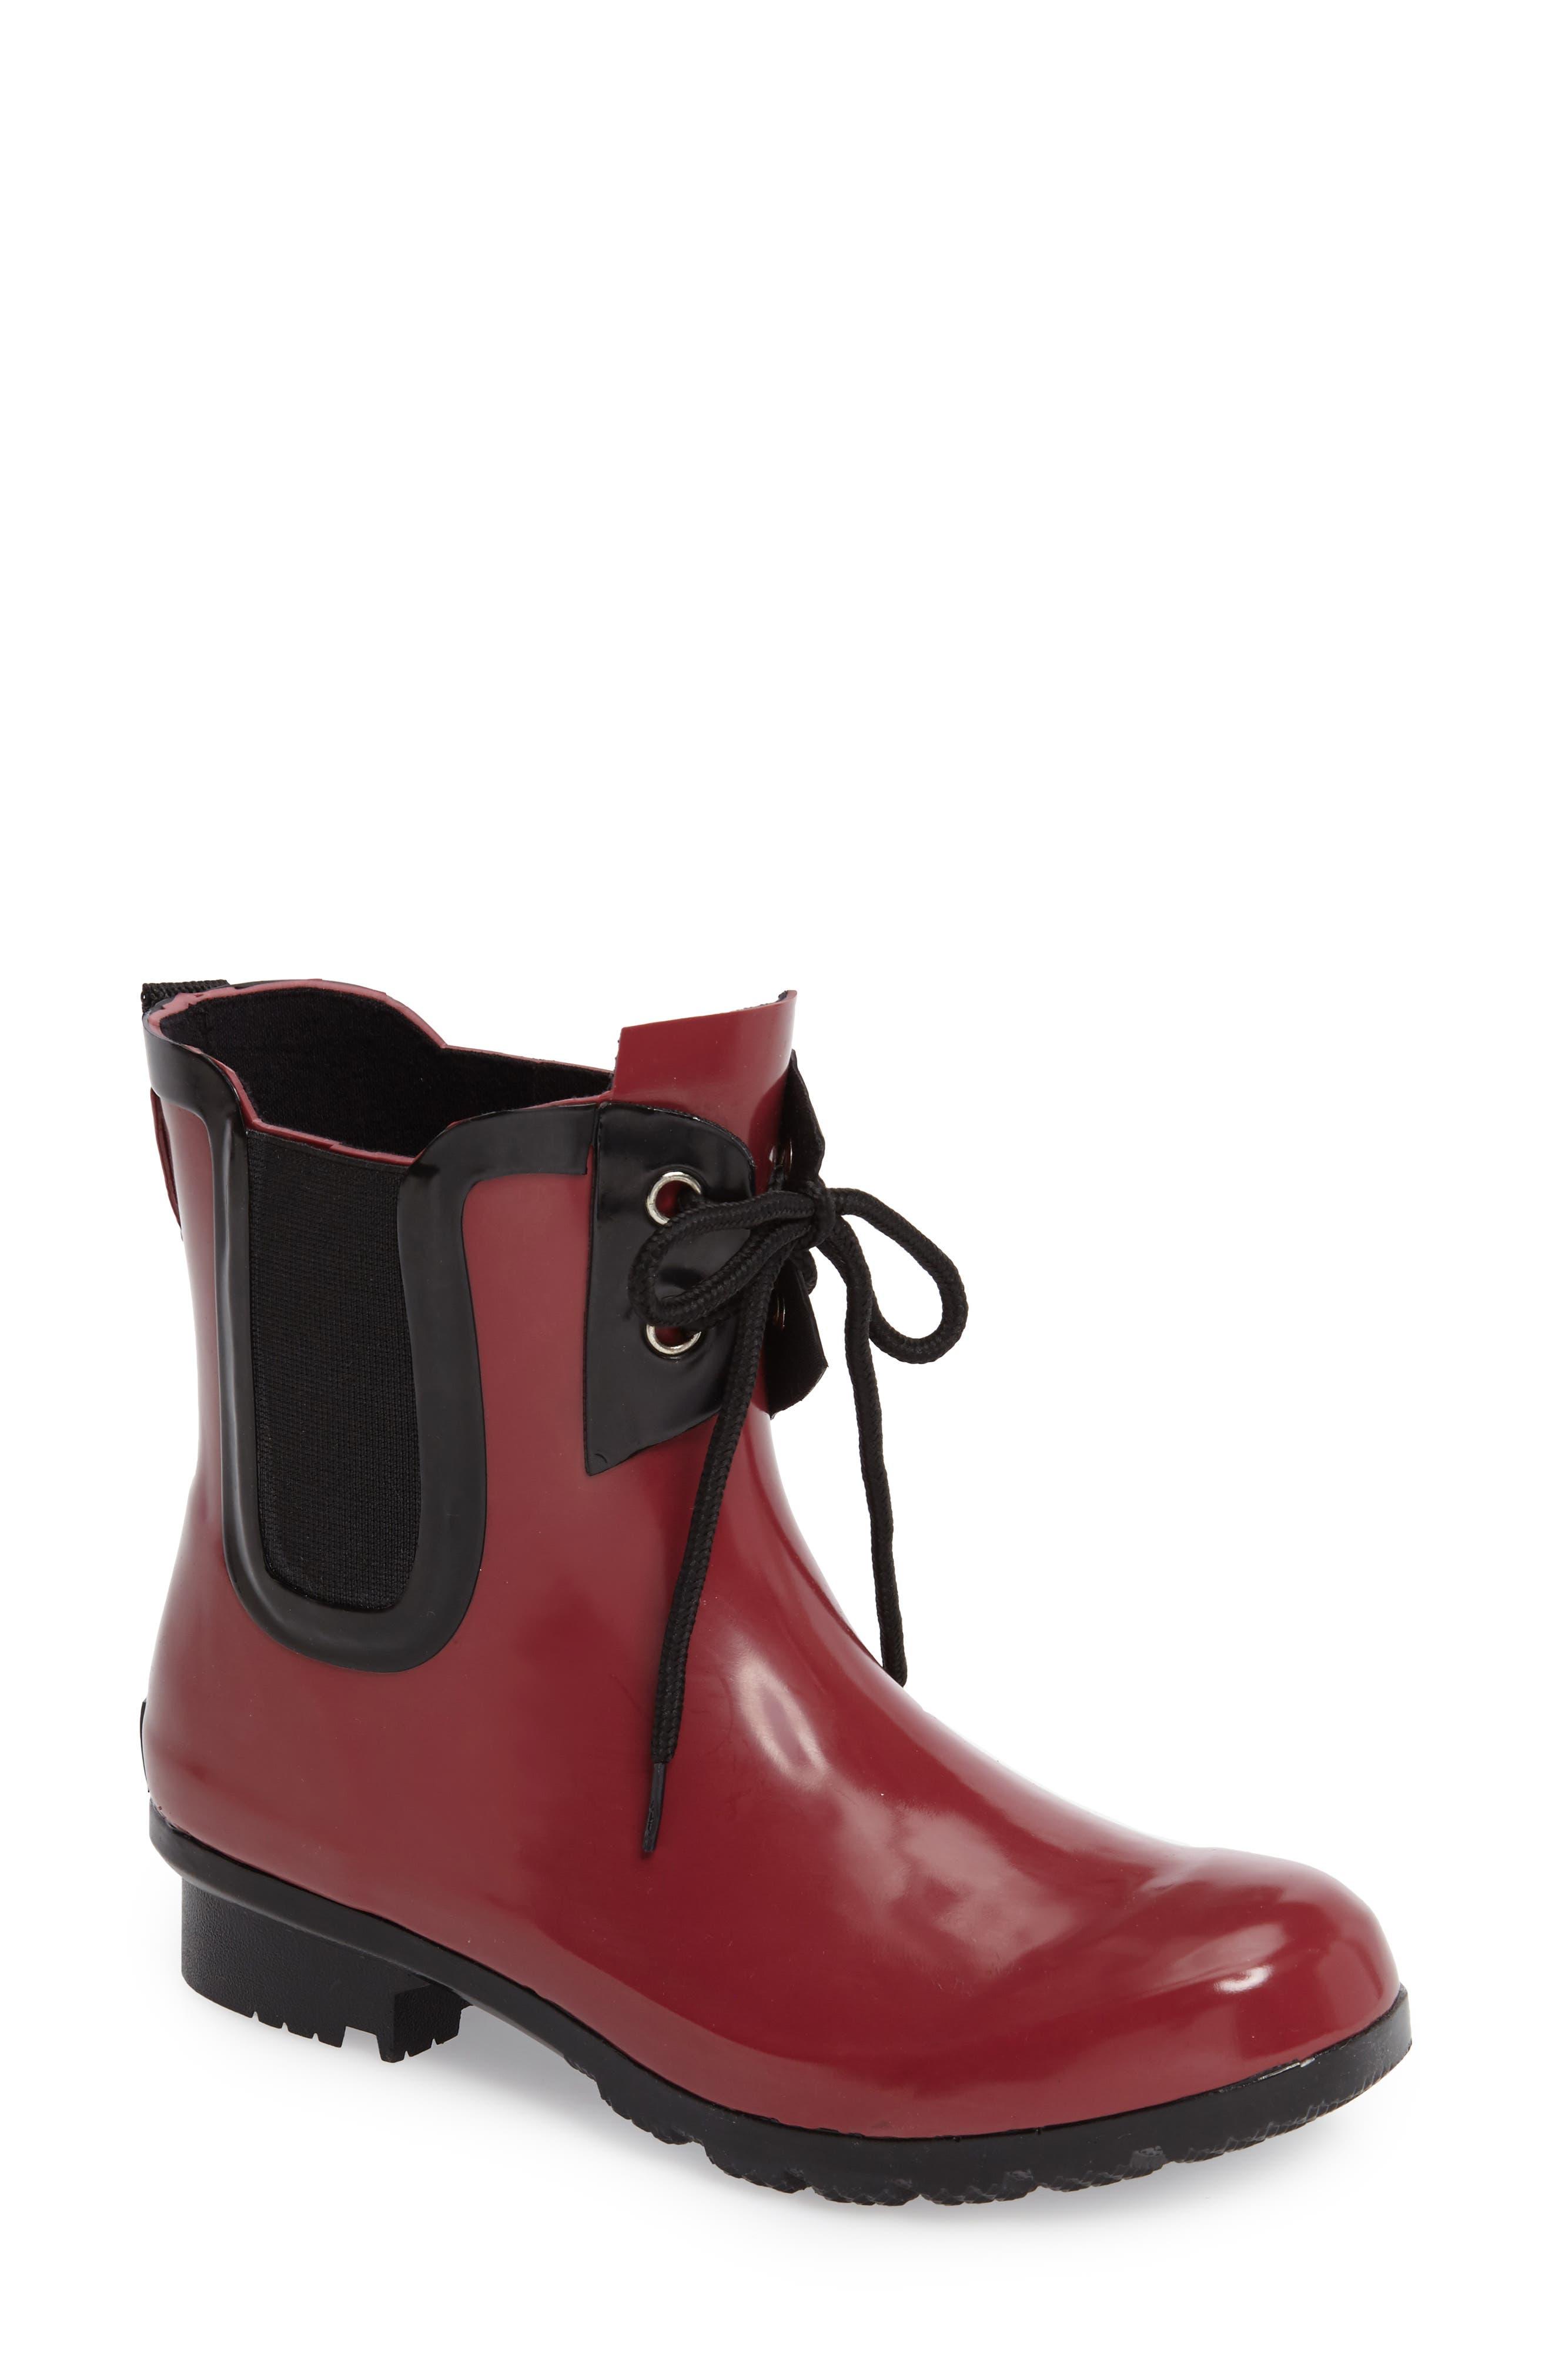 Alternate Image 1 Selected - roma Waterproof Chelsea Rain Boot (Women)